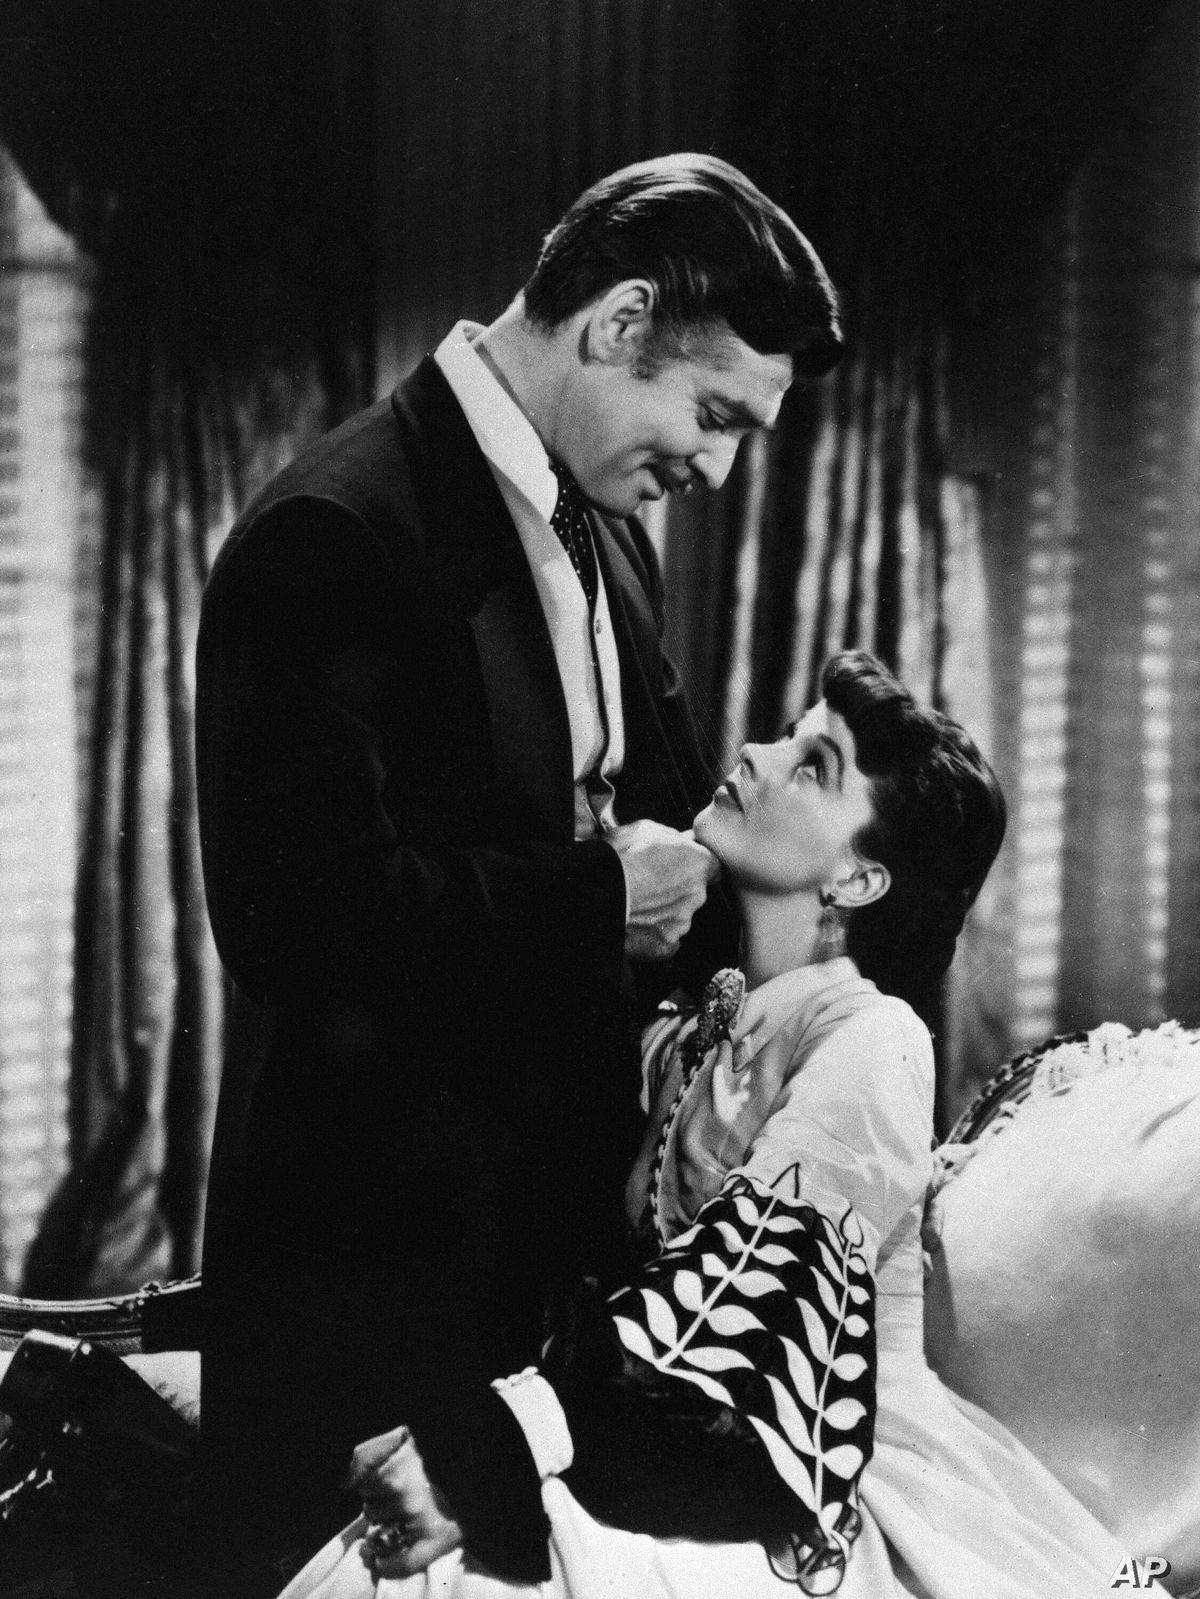 Clark Gable as Rhett Butler condescendingly chucks Scarlett O'Hara's chin in Gone With the Wind